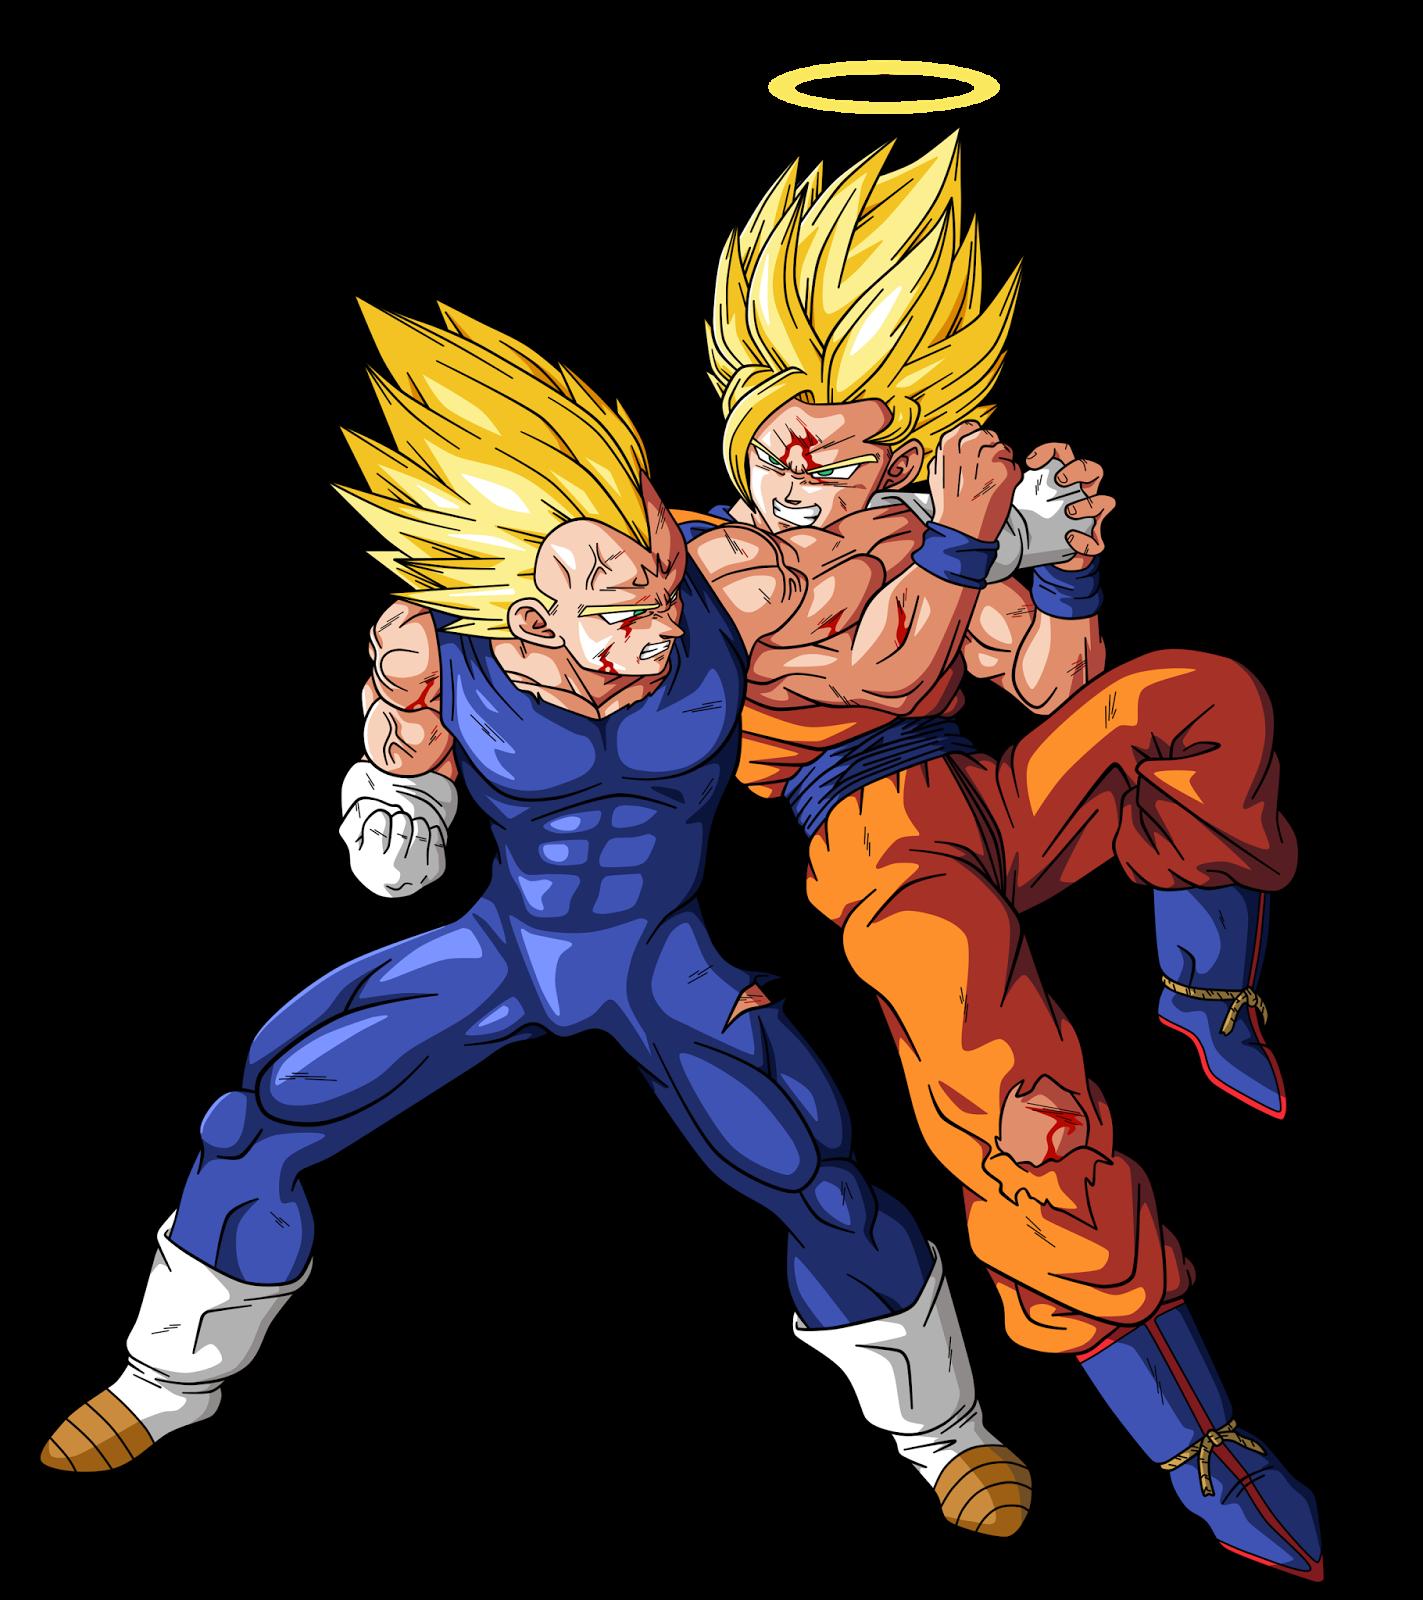 Goku y vegeta goku y vegeta - Dbz goku vegeta ...